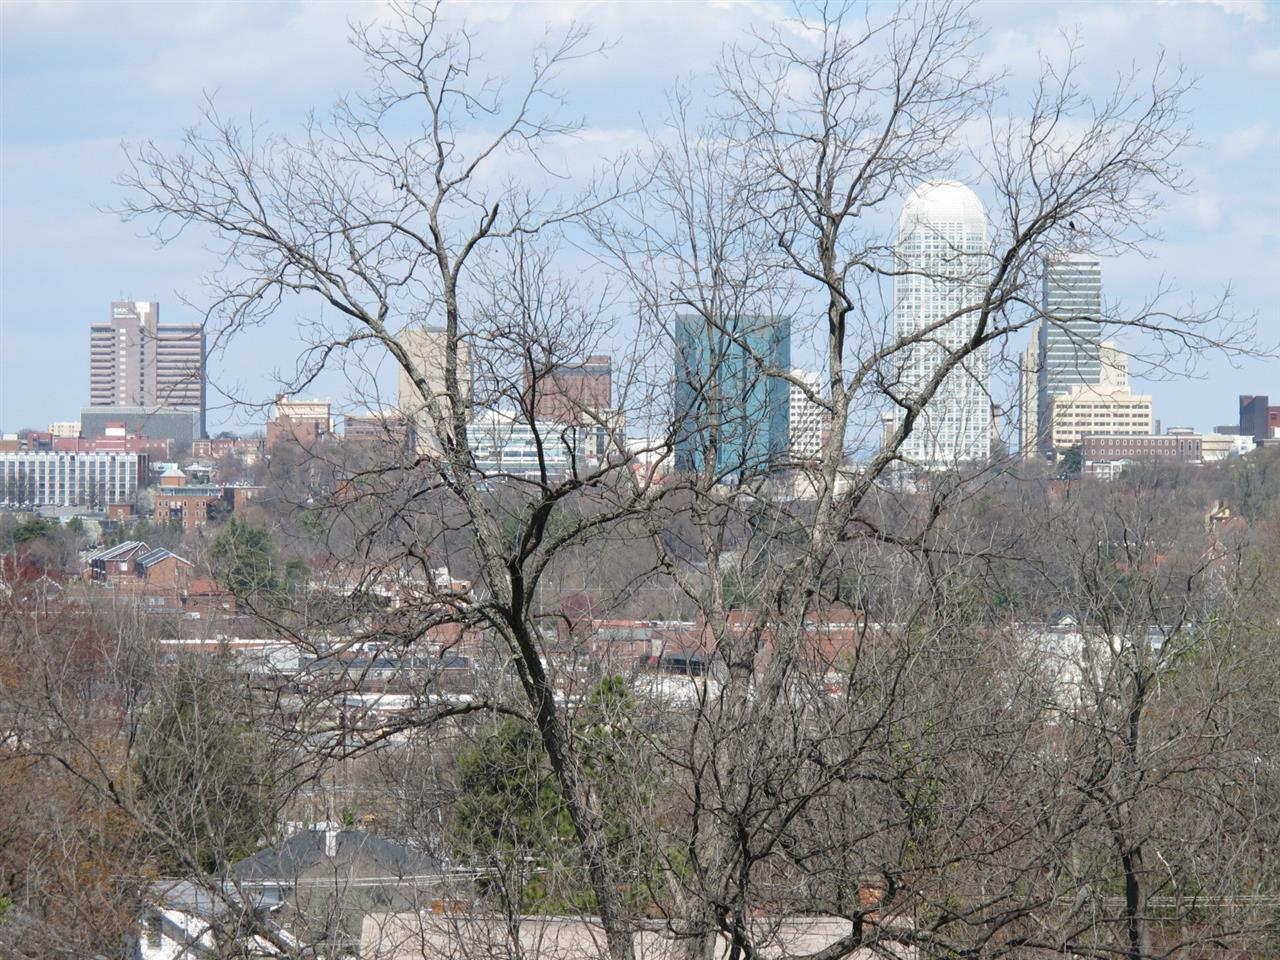 Winston-Salem,NC skyline from Washington Park